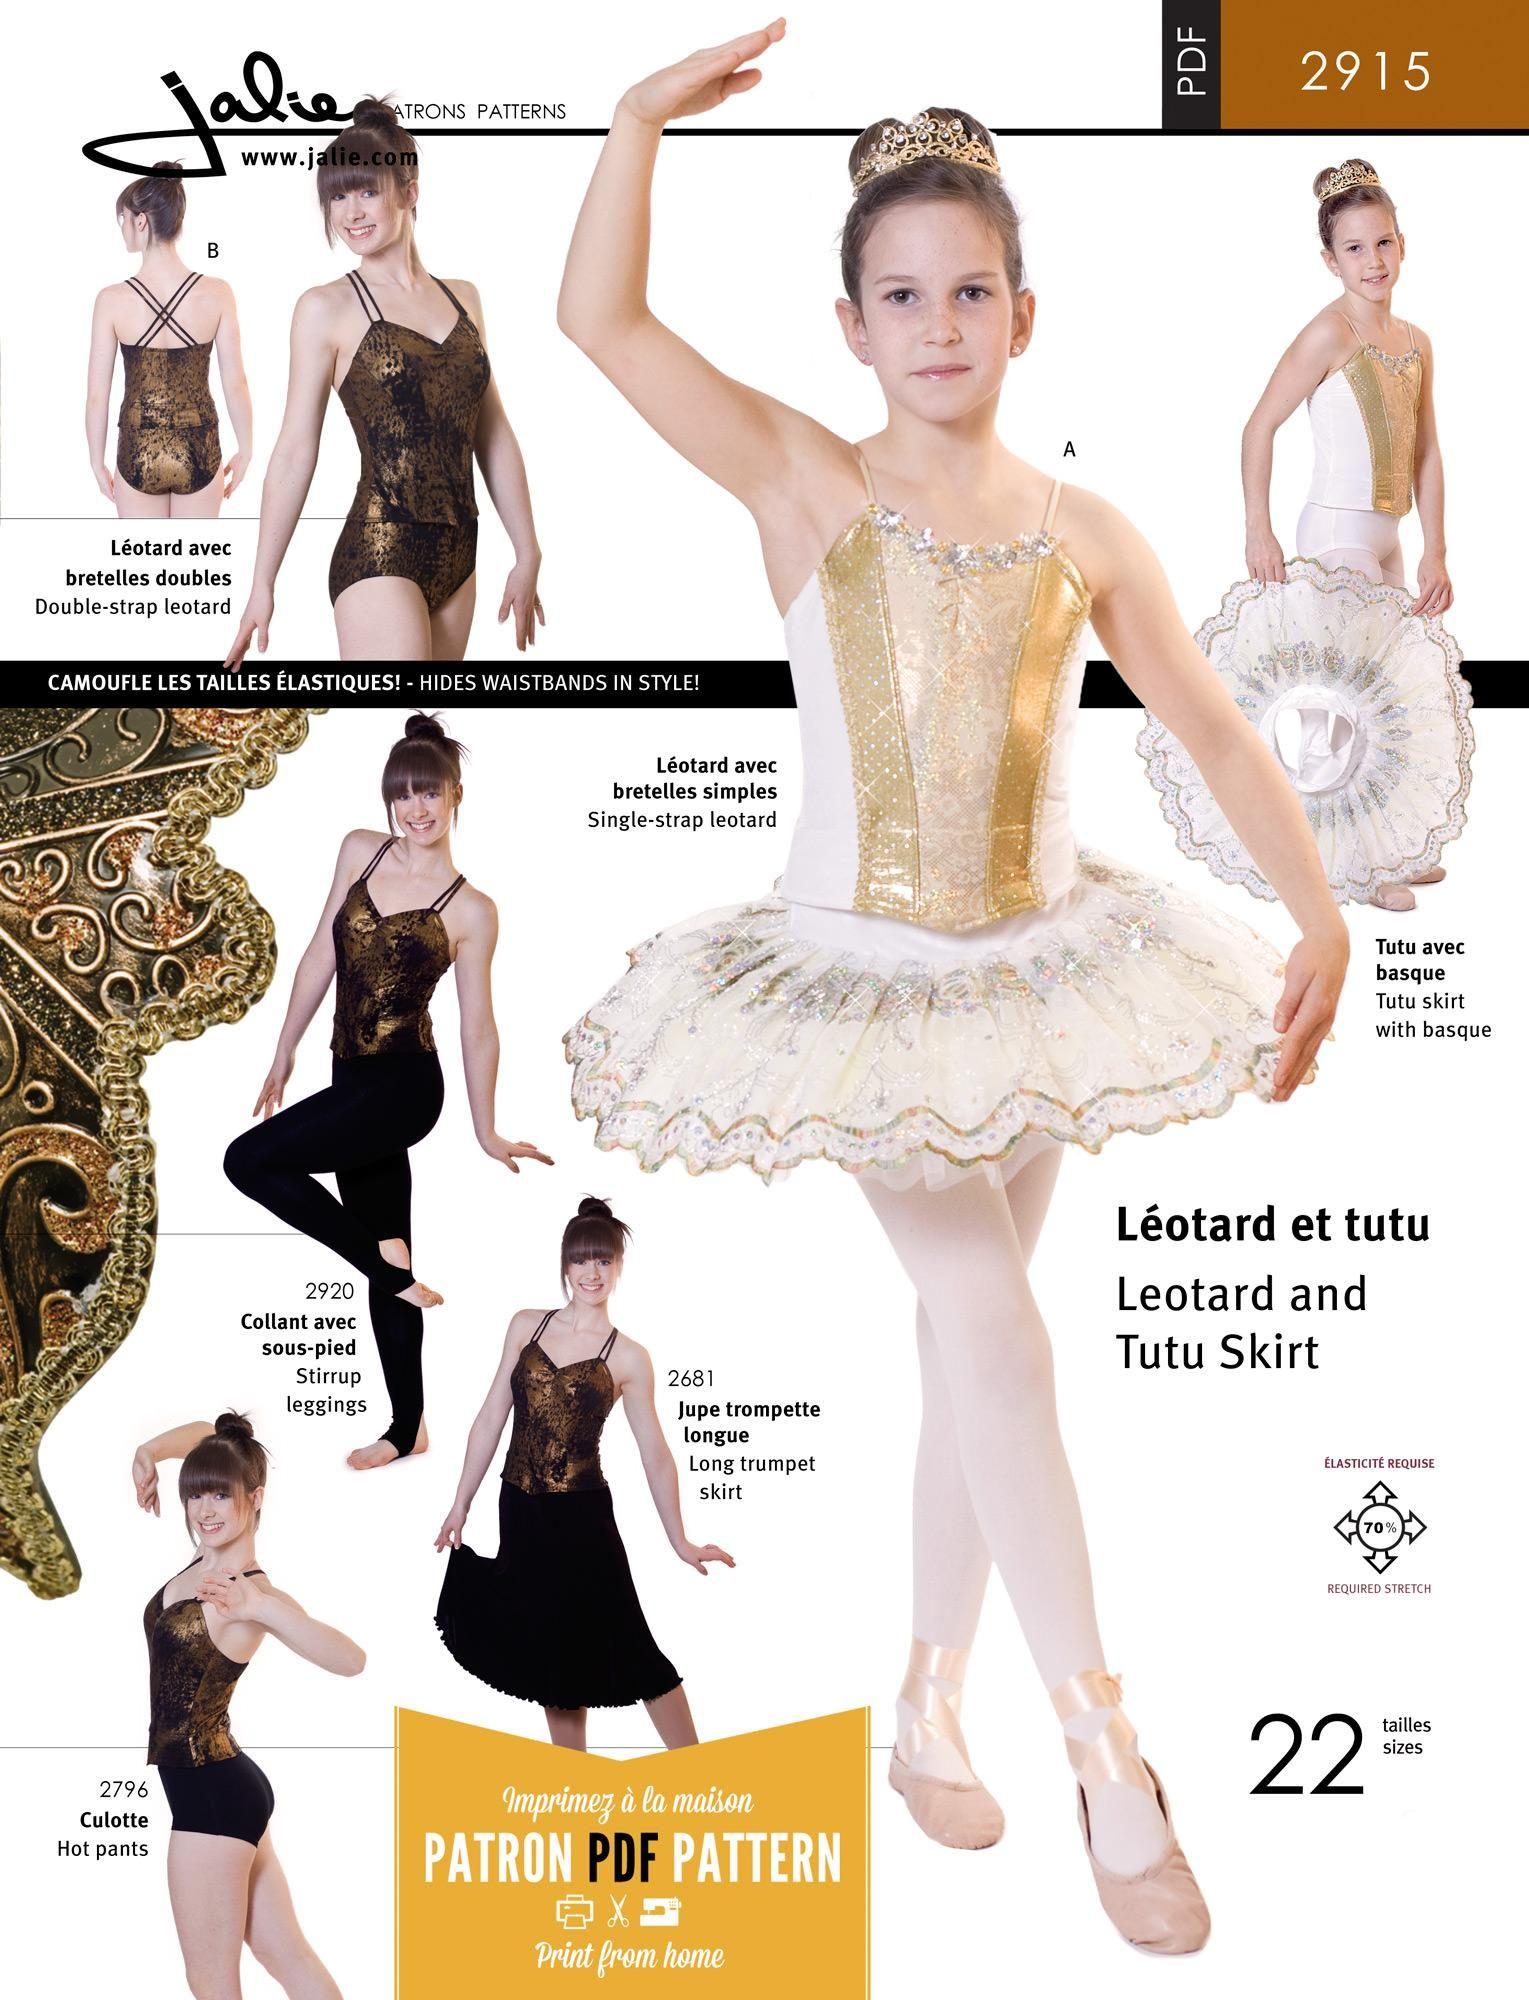 Jalie 2915 - Stretch Tutu (Leotard + Skirt) PDF Pattern Cover | this ...